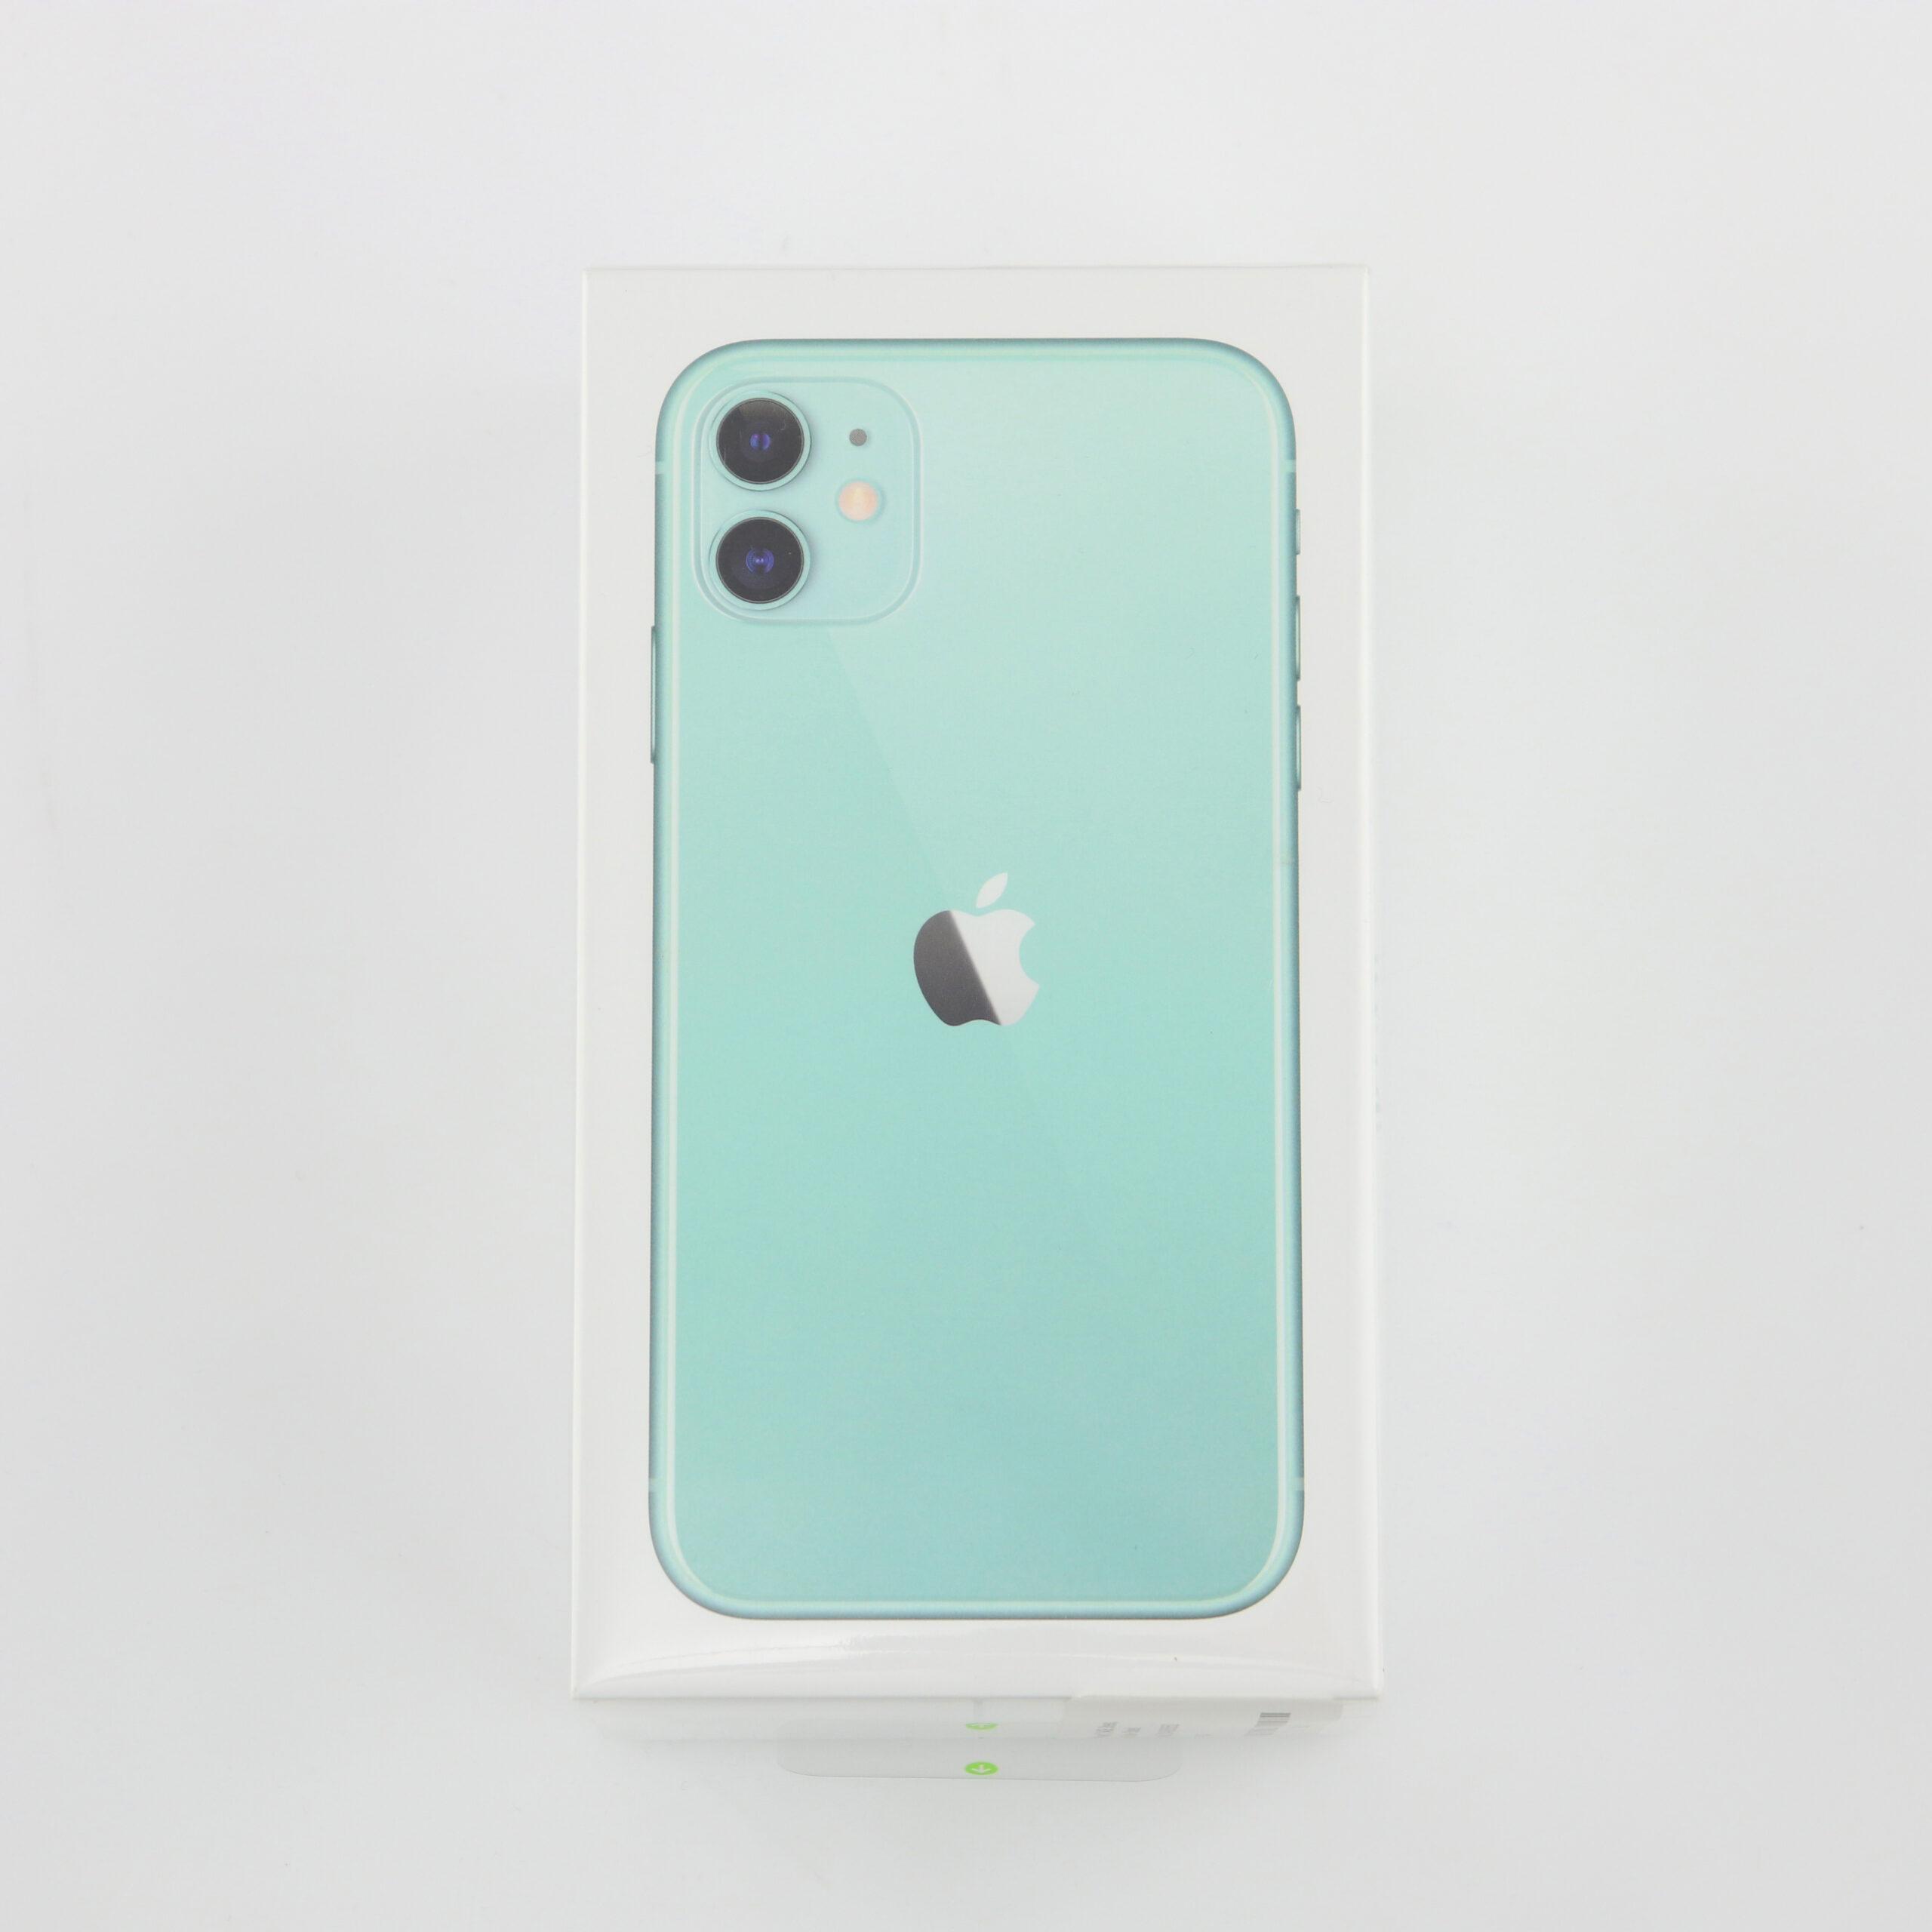 1 x Apple iPhone 11 (Unlocked) 64GB Green (BRAND NEW)